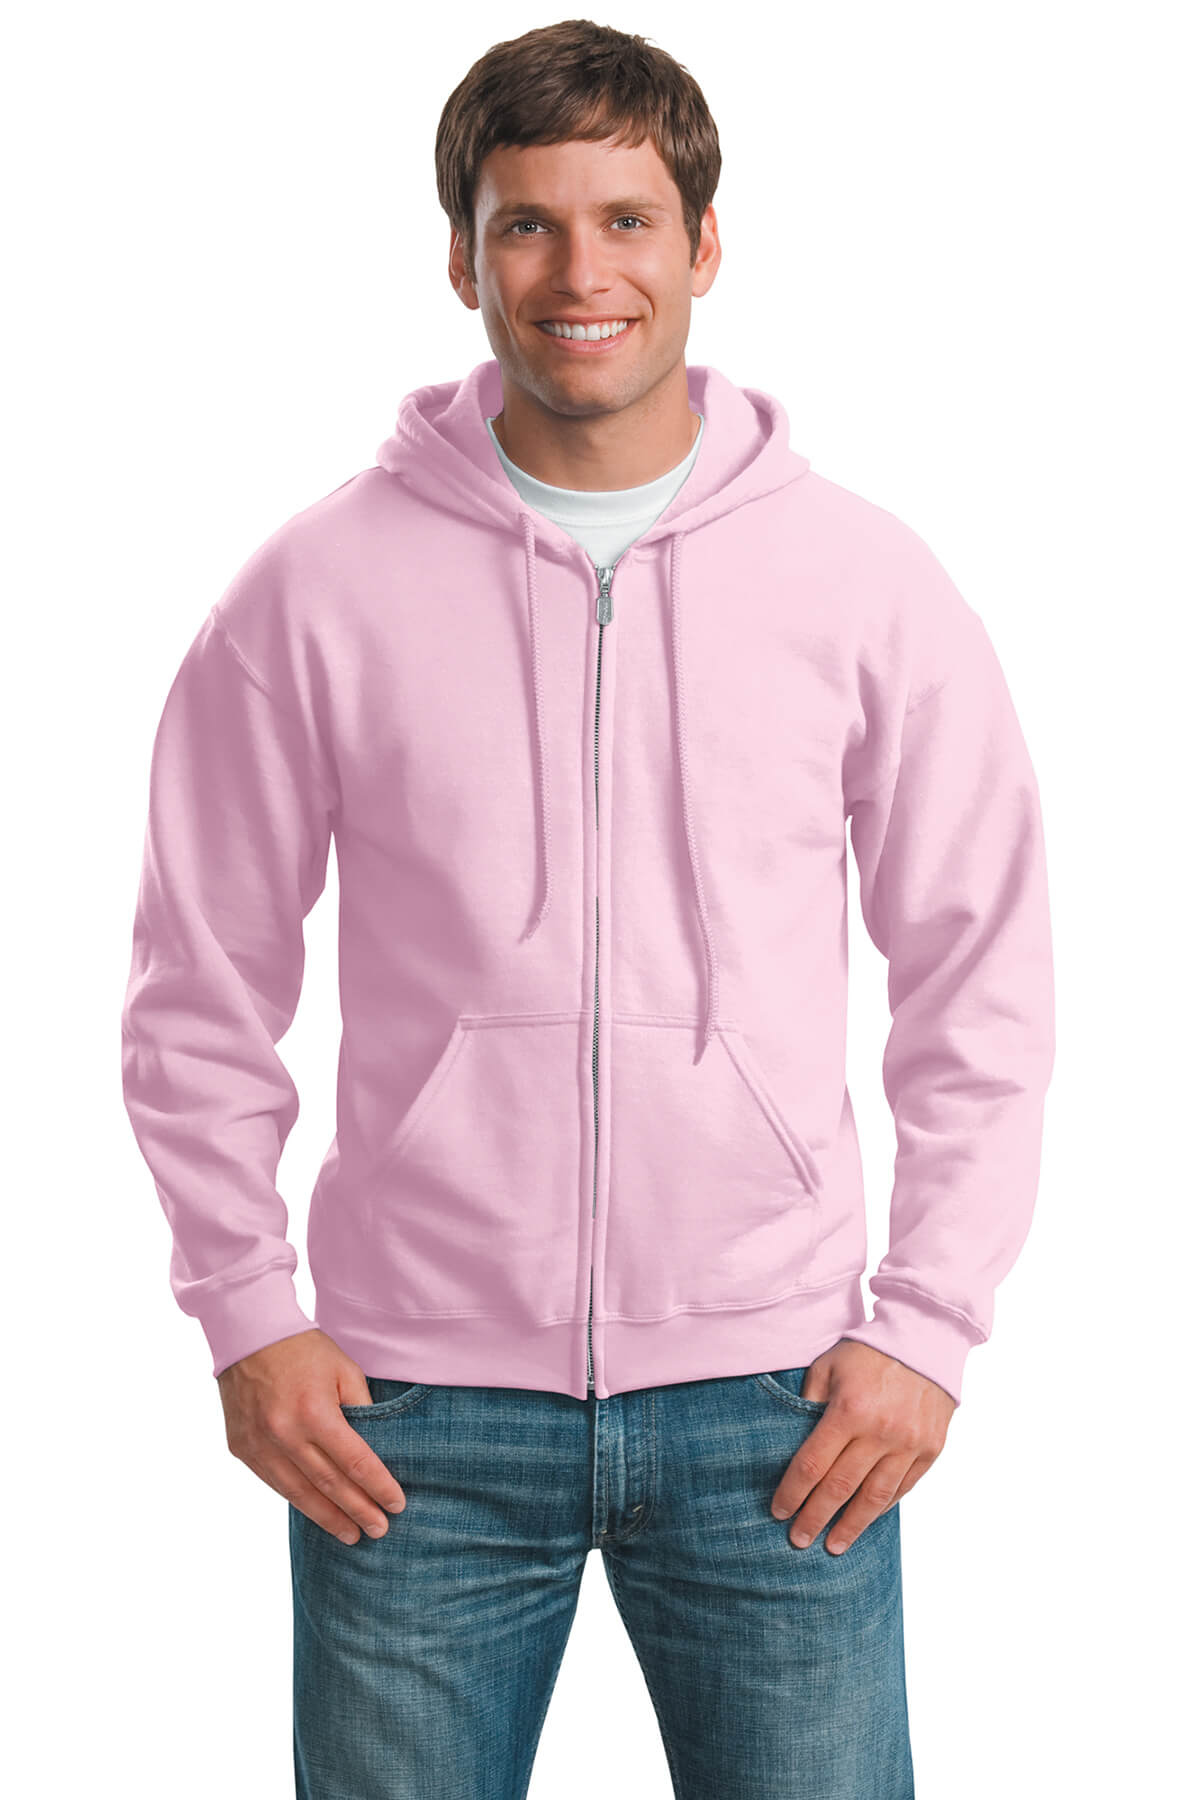 18600-light-pink-1